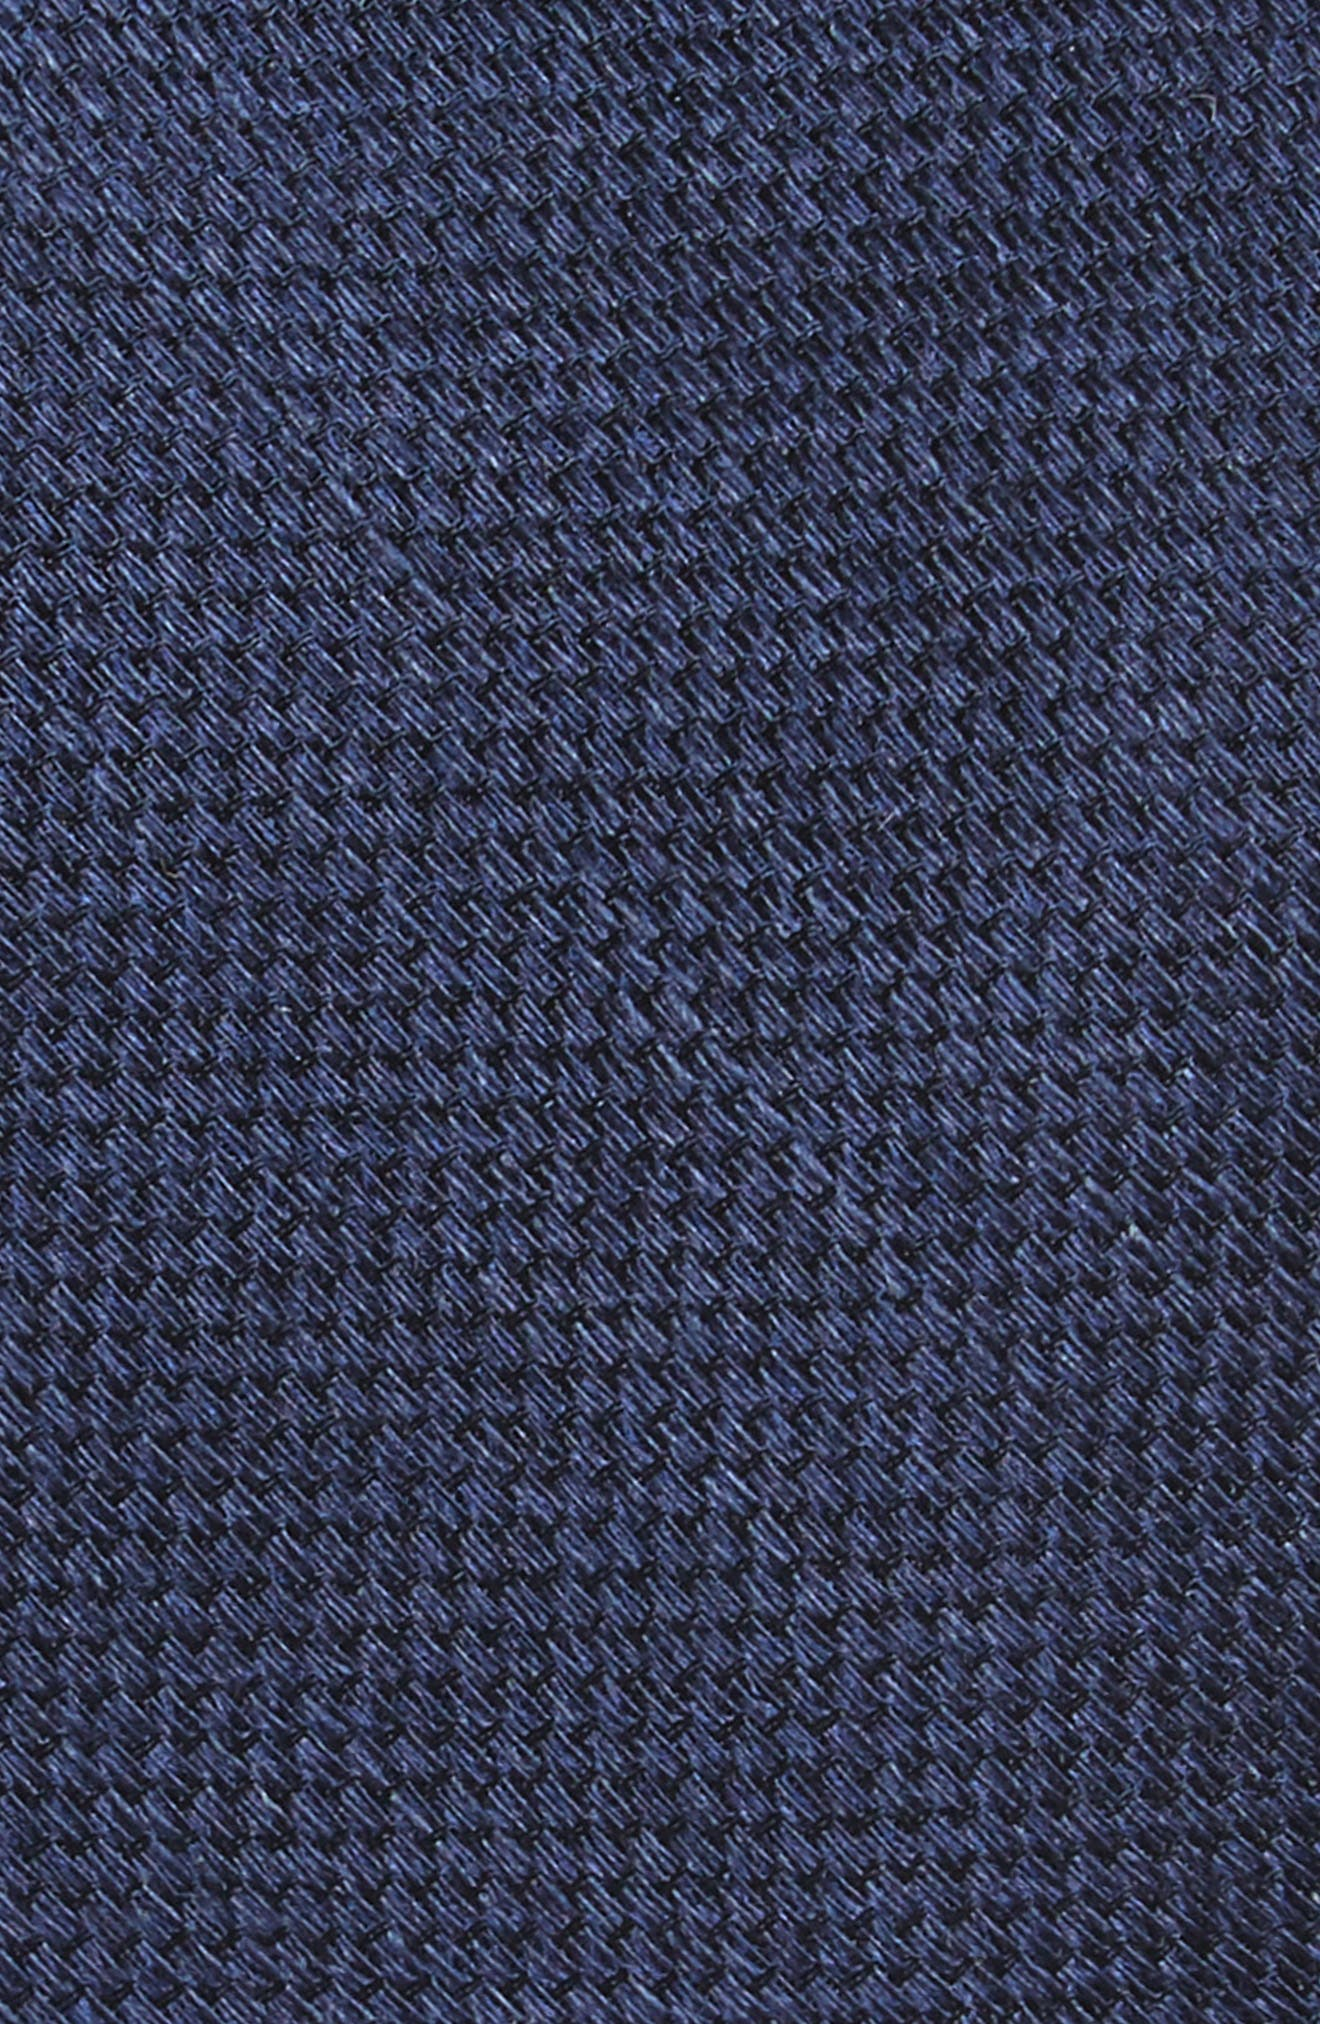 Festival Textured Silk & Linen Tie,                             Alternate thumbnail 2, color,                             Navy